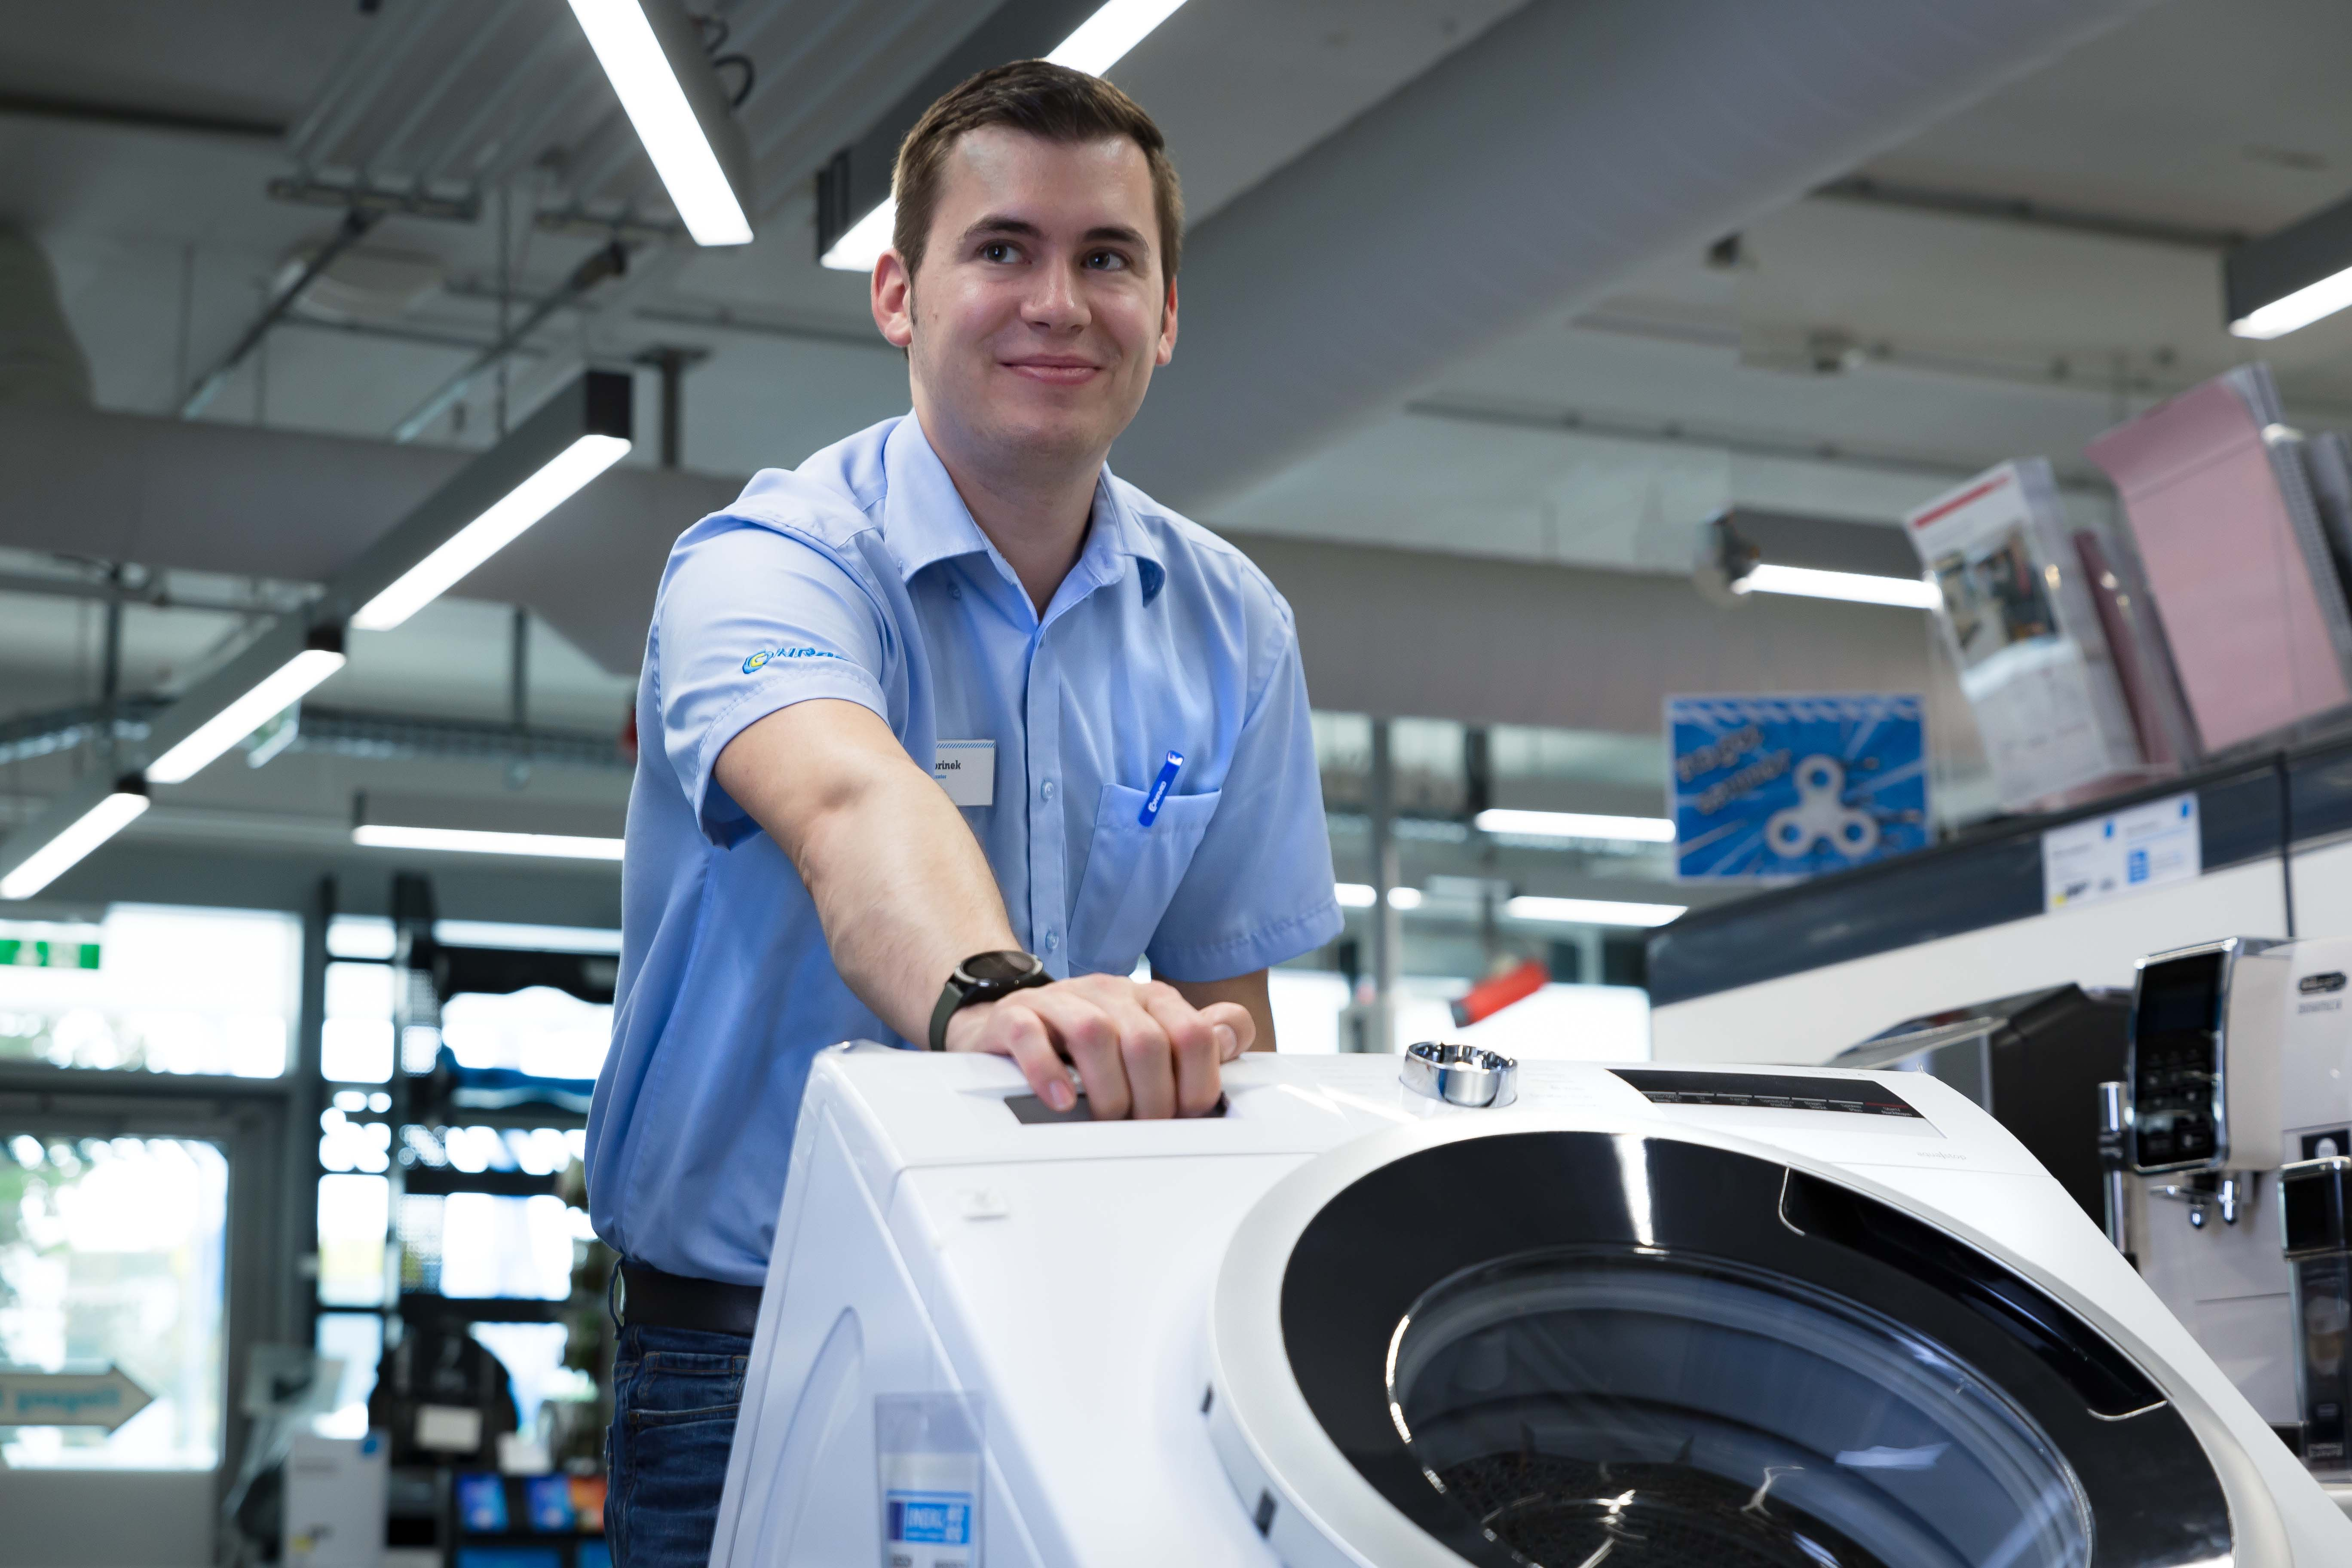 Business_Commercial_Haustechnik_Conrad